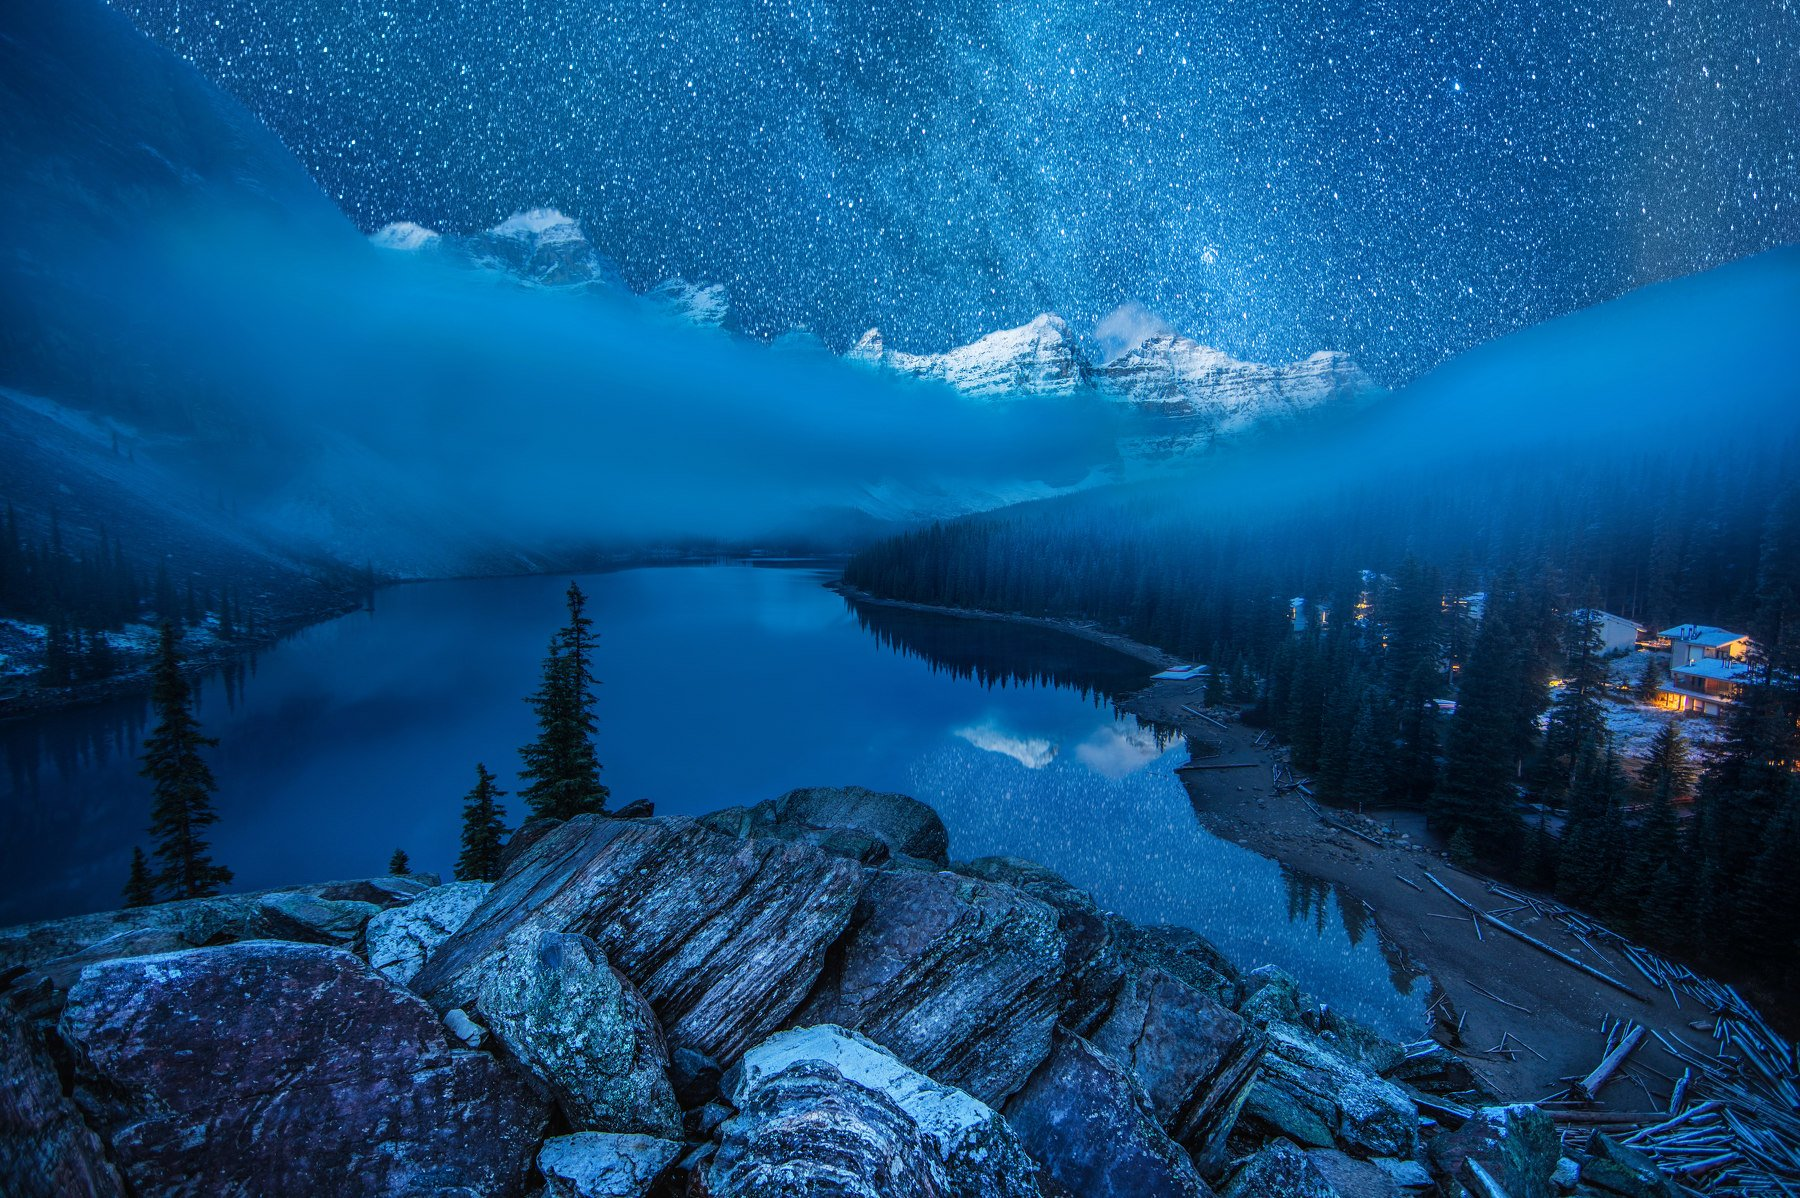 озеро морейн, канада, звезды, горы, отражения, туман, Алексей Сулоев